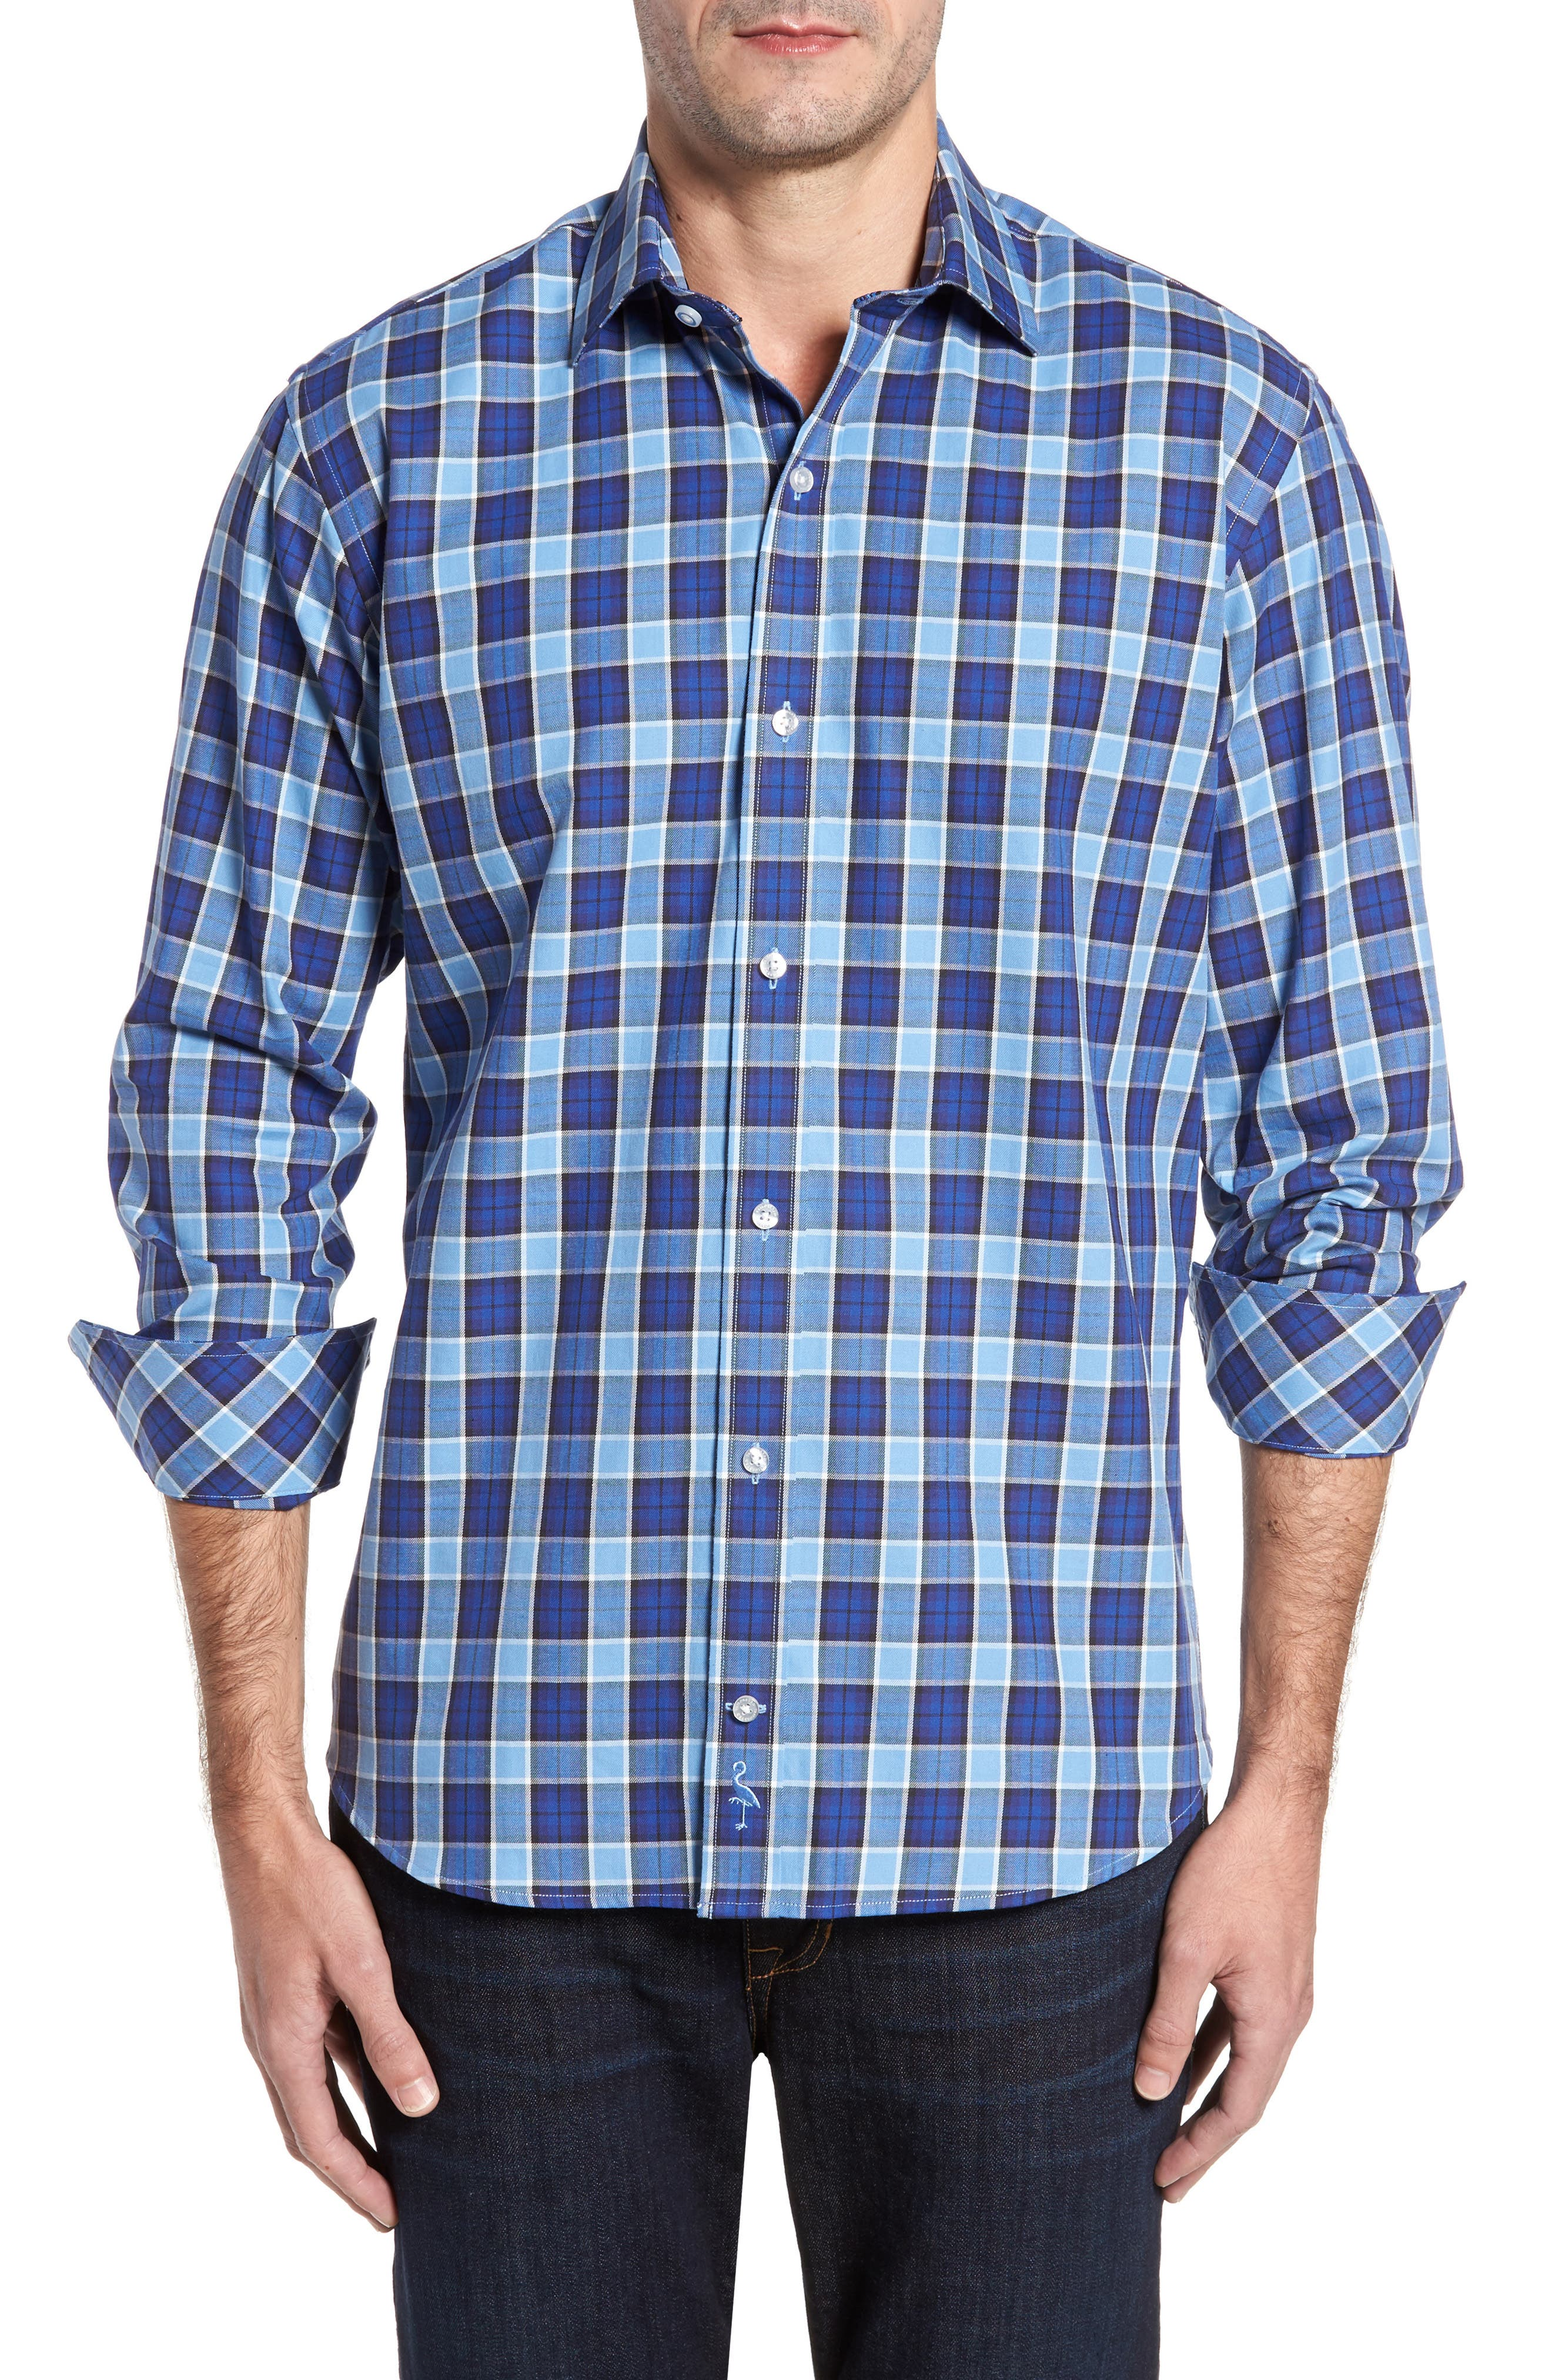 Boothville Check Sport Shirt,                             Main thumbnail 1, color,                             416